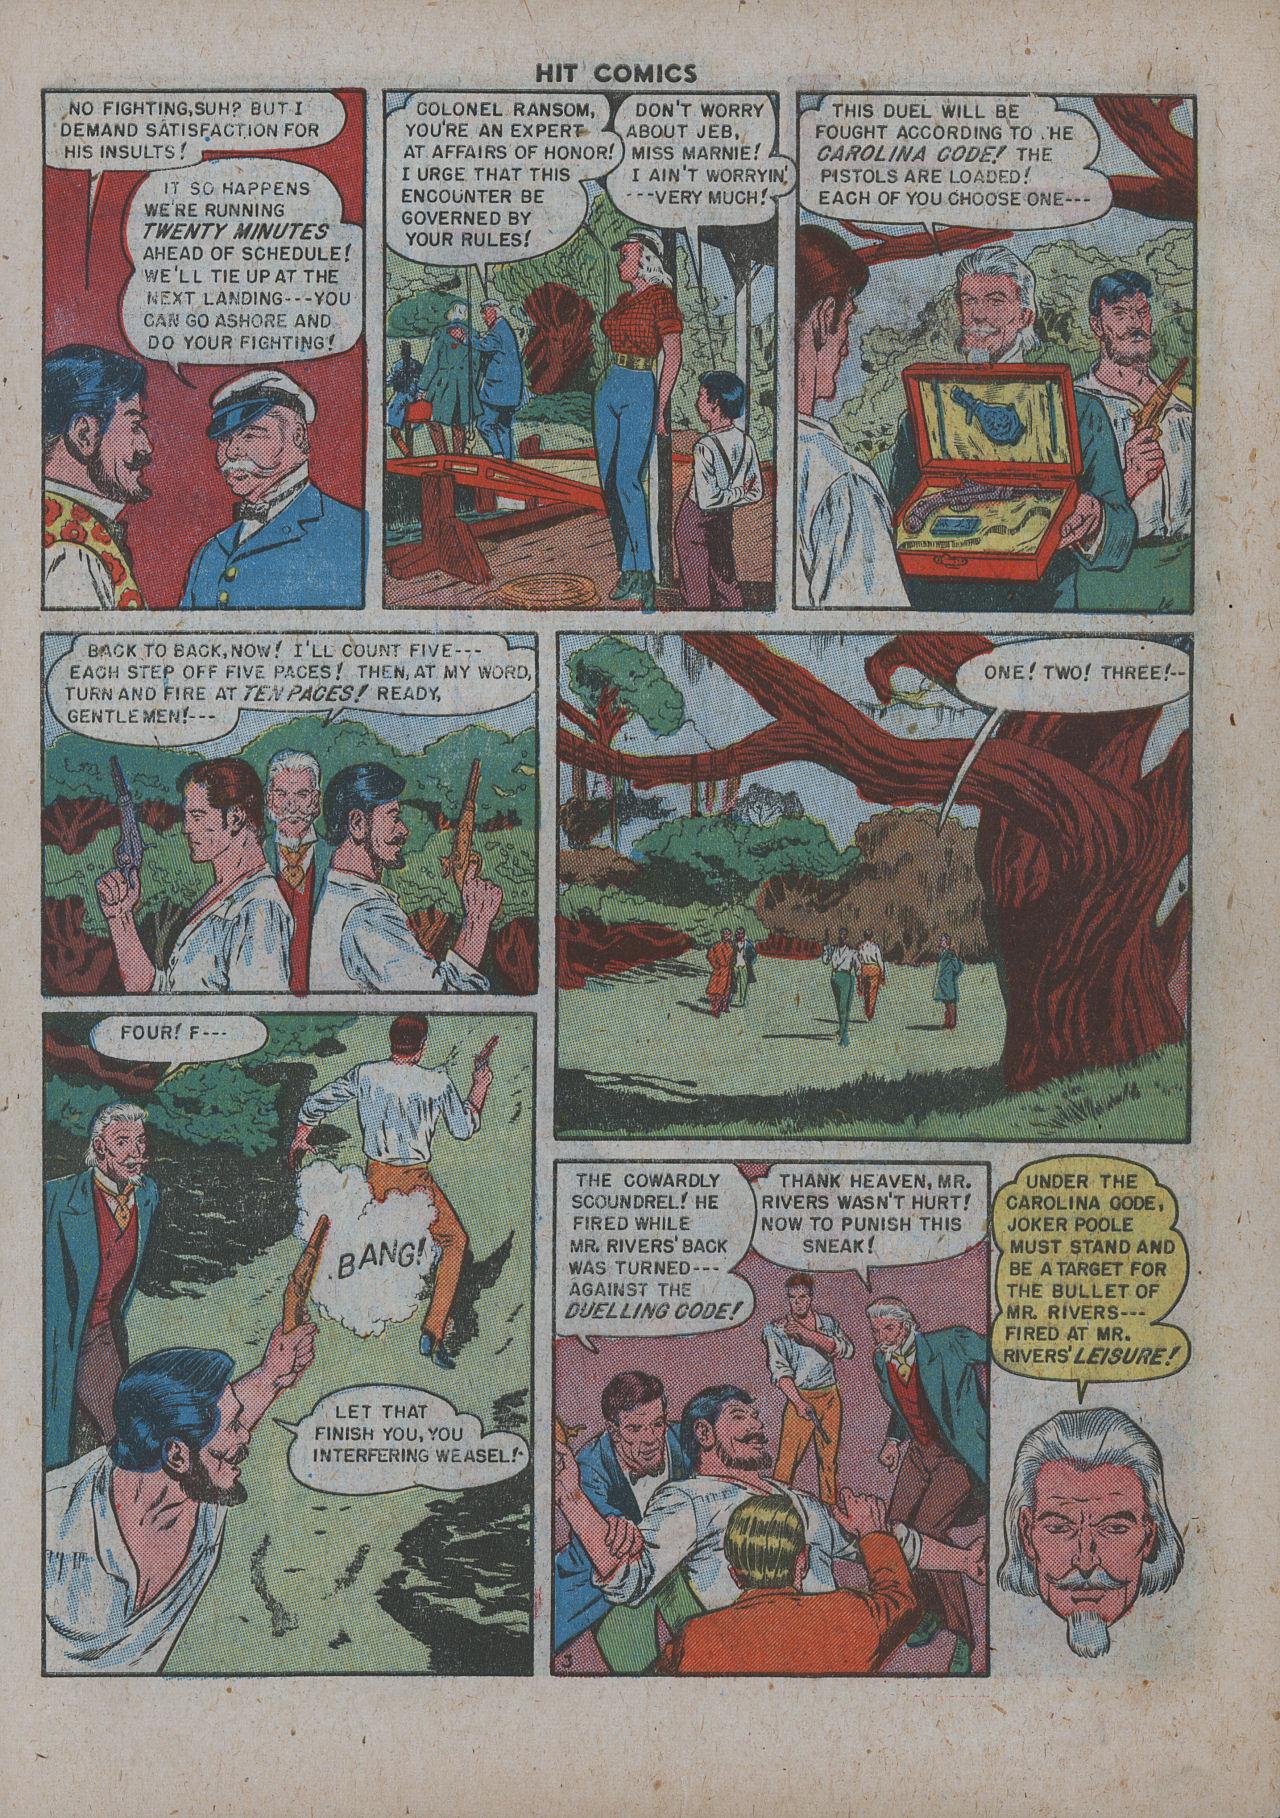 Read online Hit Comics comic -  Issue #63 - 5